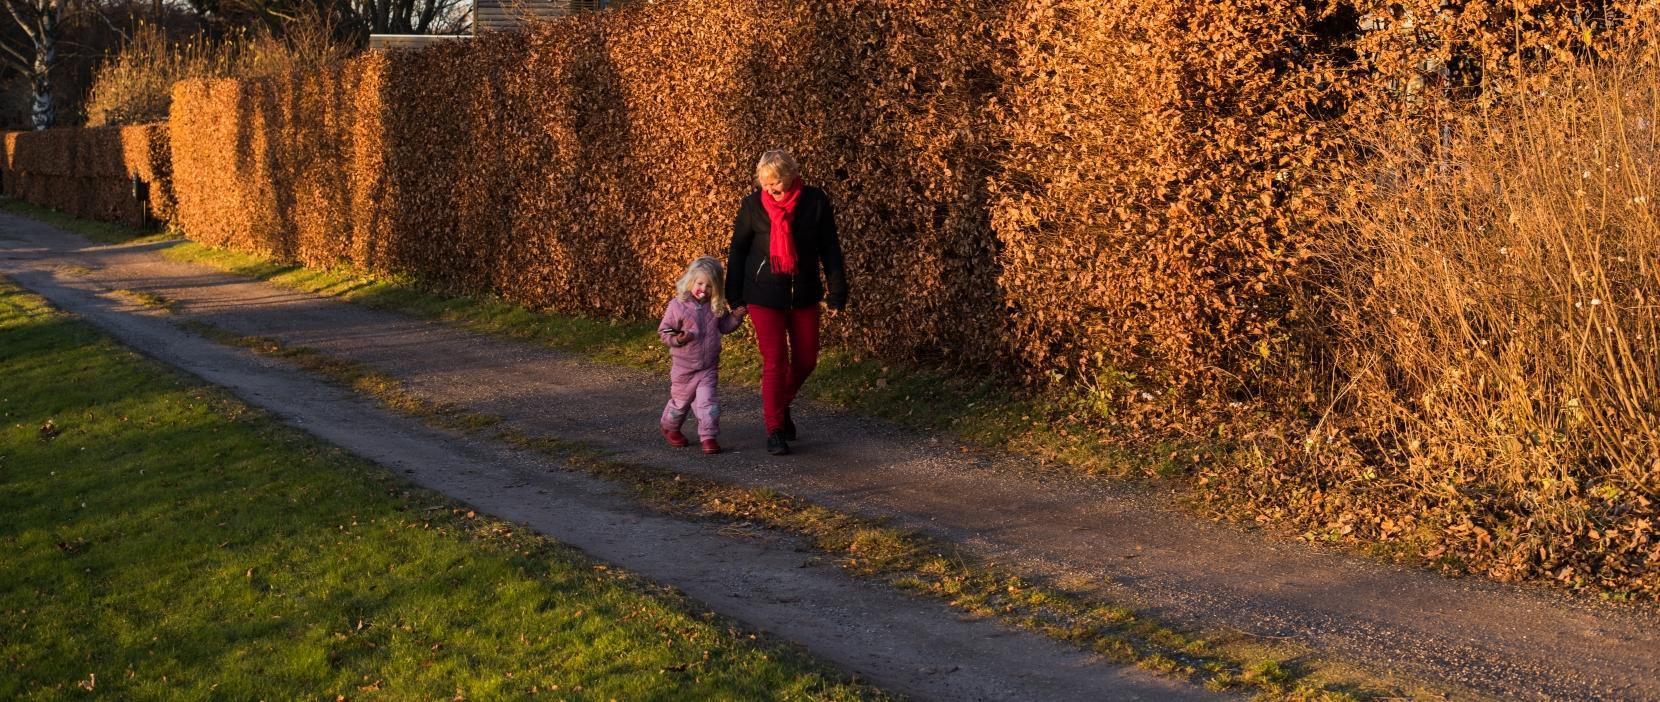 Mormor og barnebarn går tur i efteråret